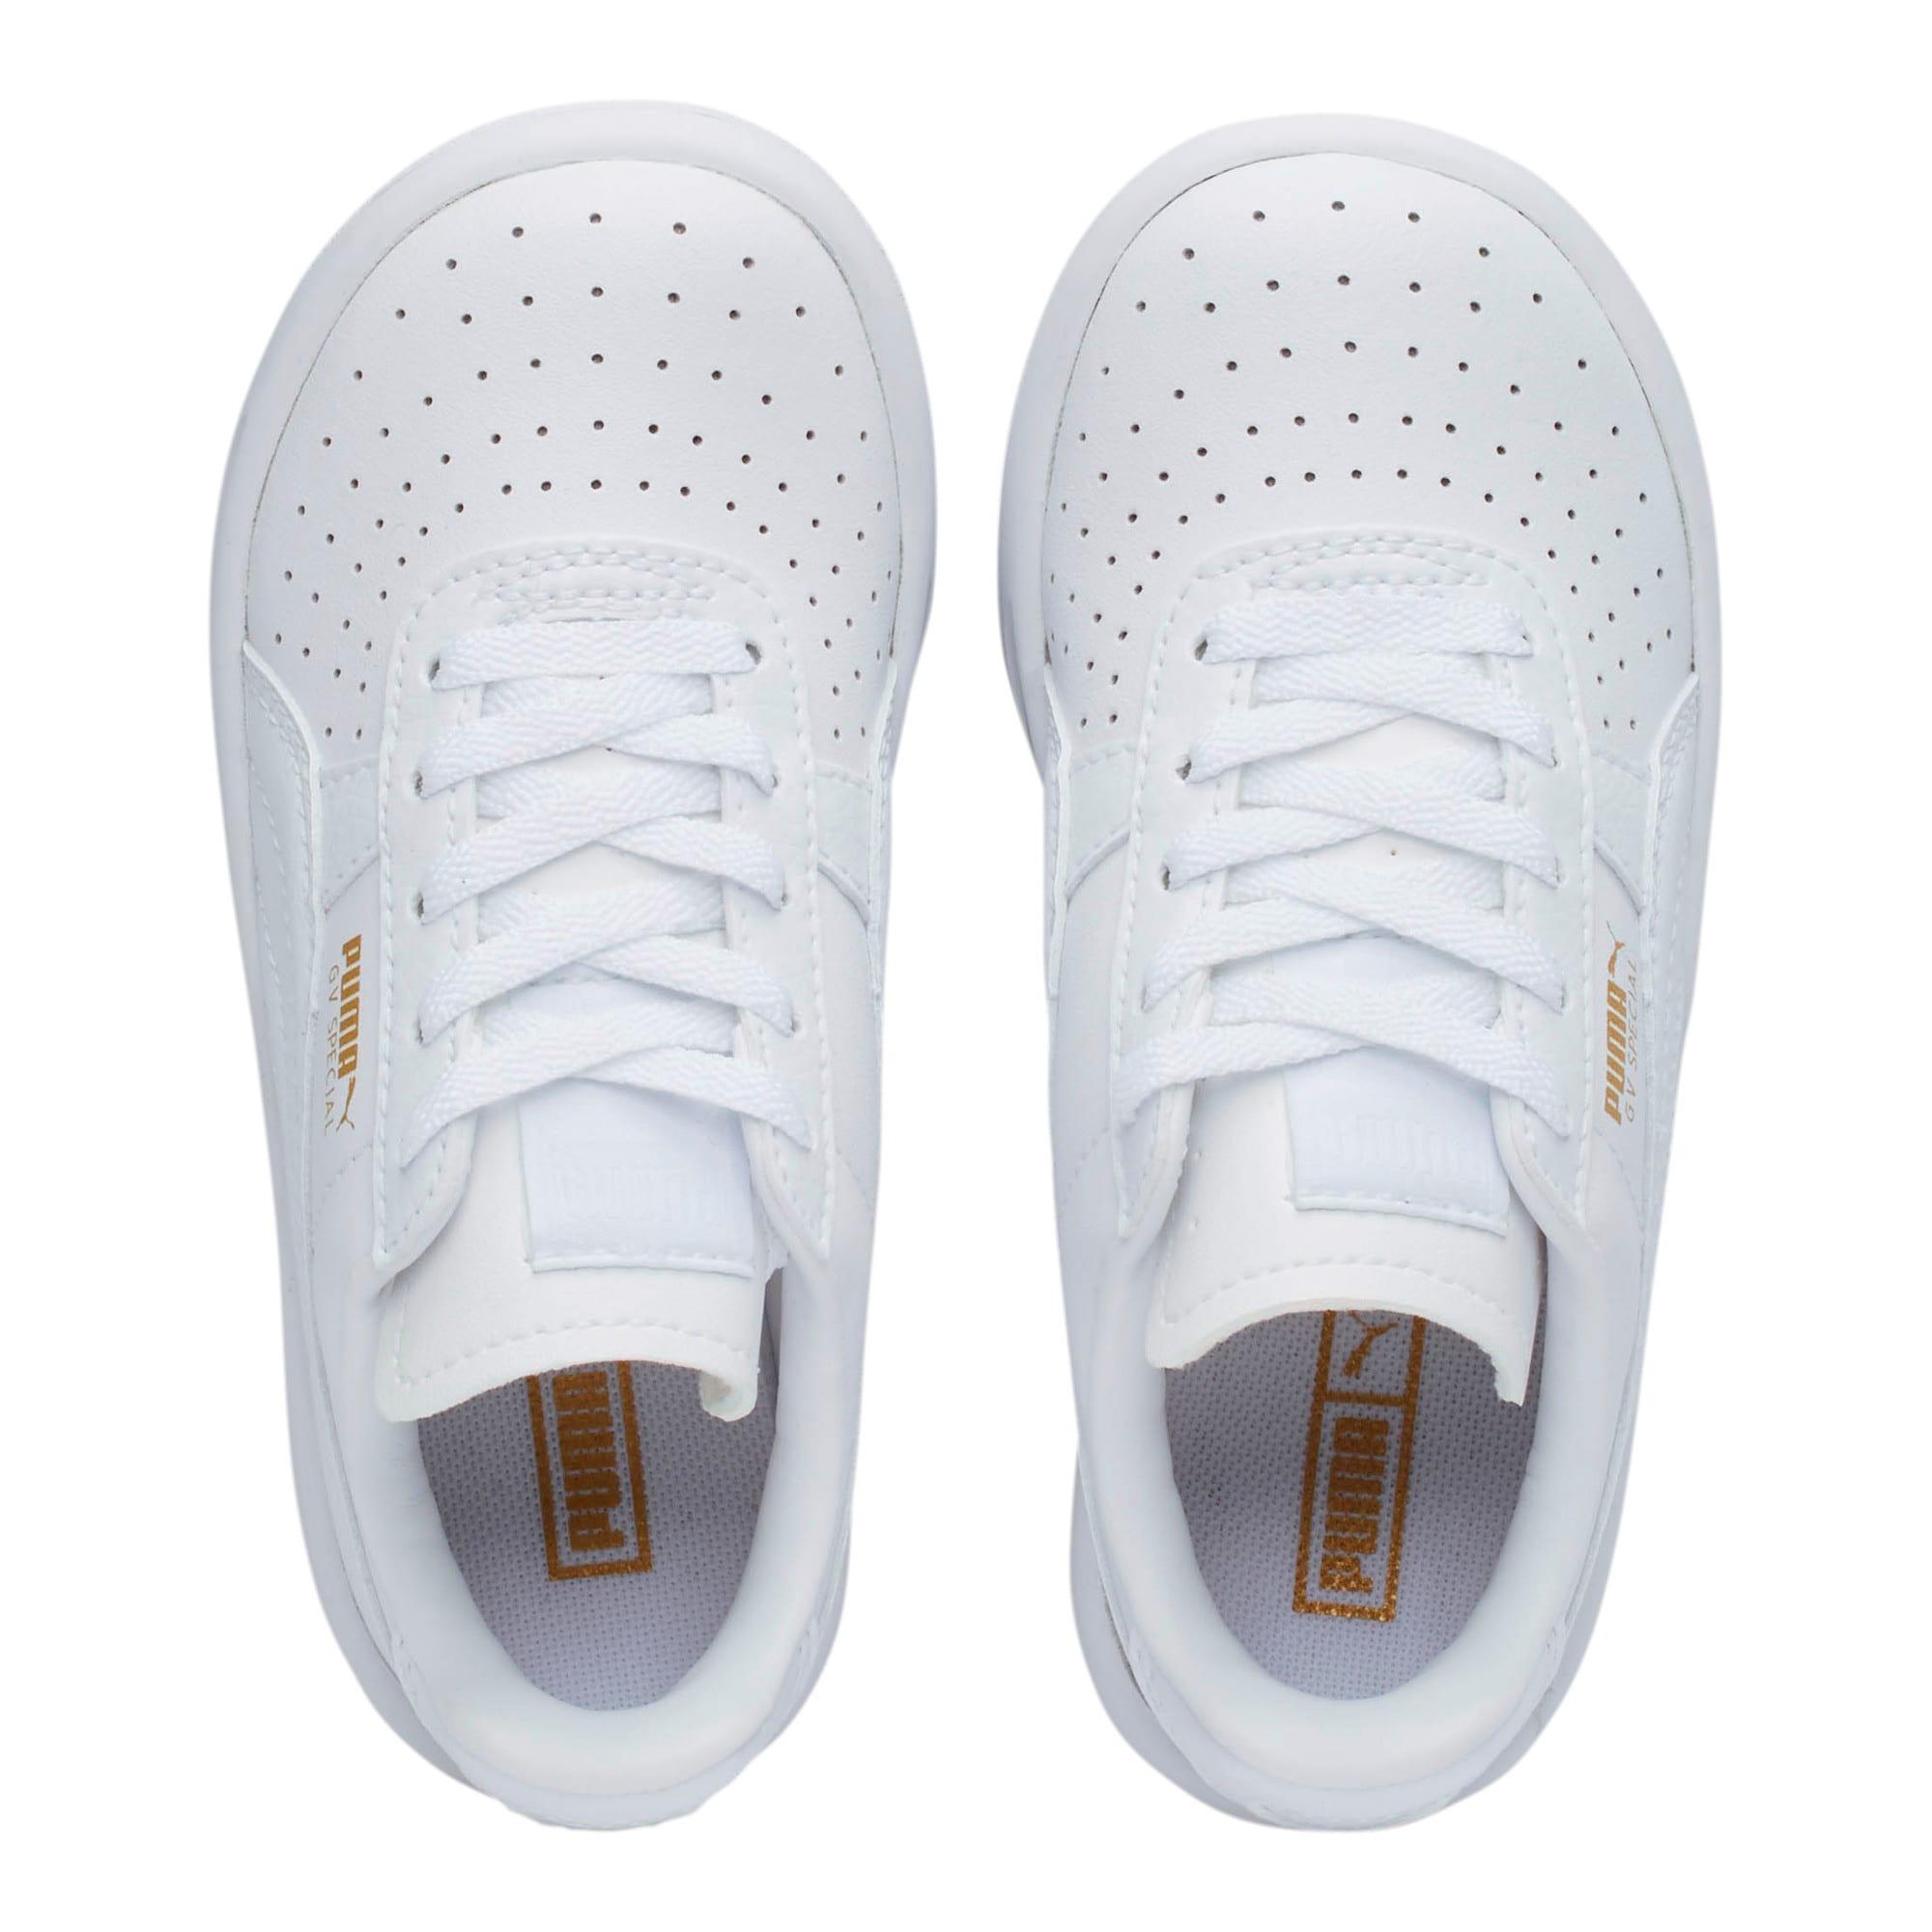 Thumbnail 6 of GV Special Little Kids' Shoes, Puma White-Puma Team Gold, medium